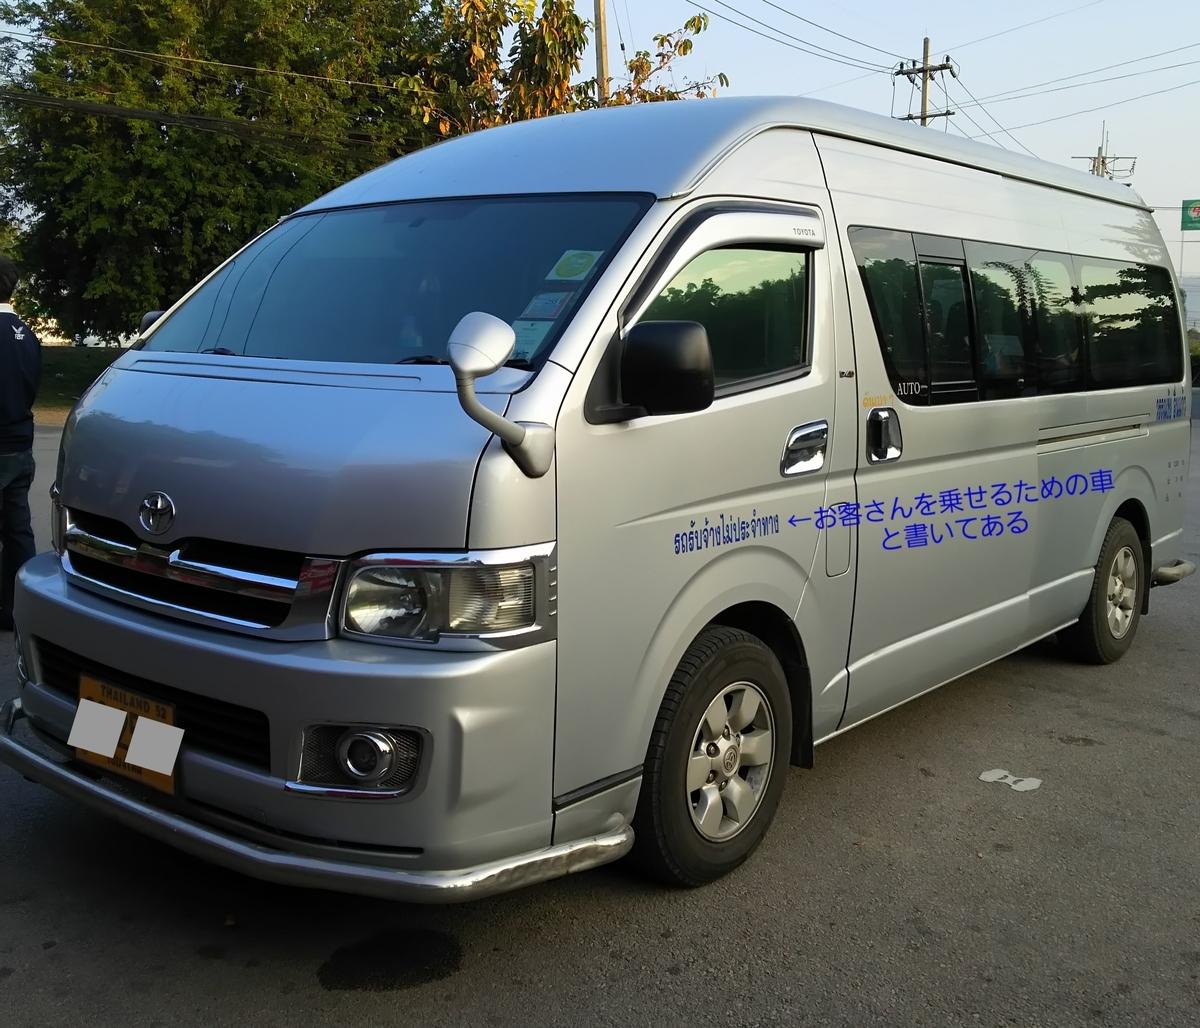 f:id:c-m-yorimichi:20210823183235j:plain